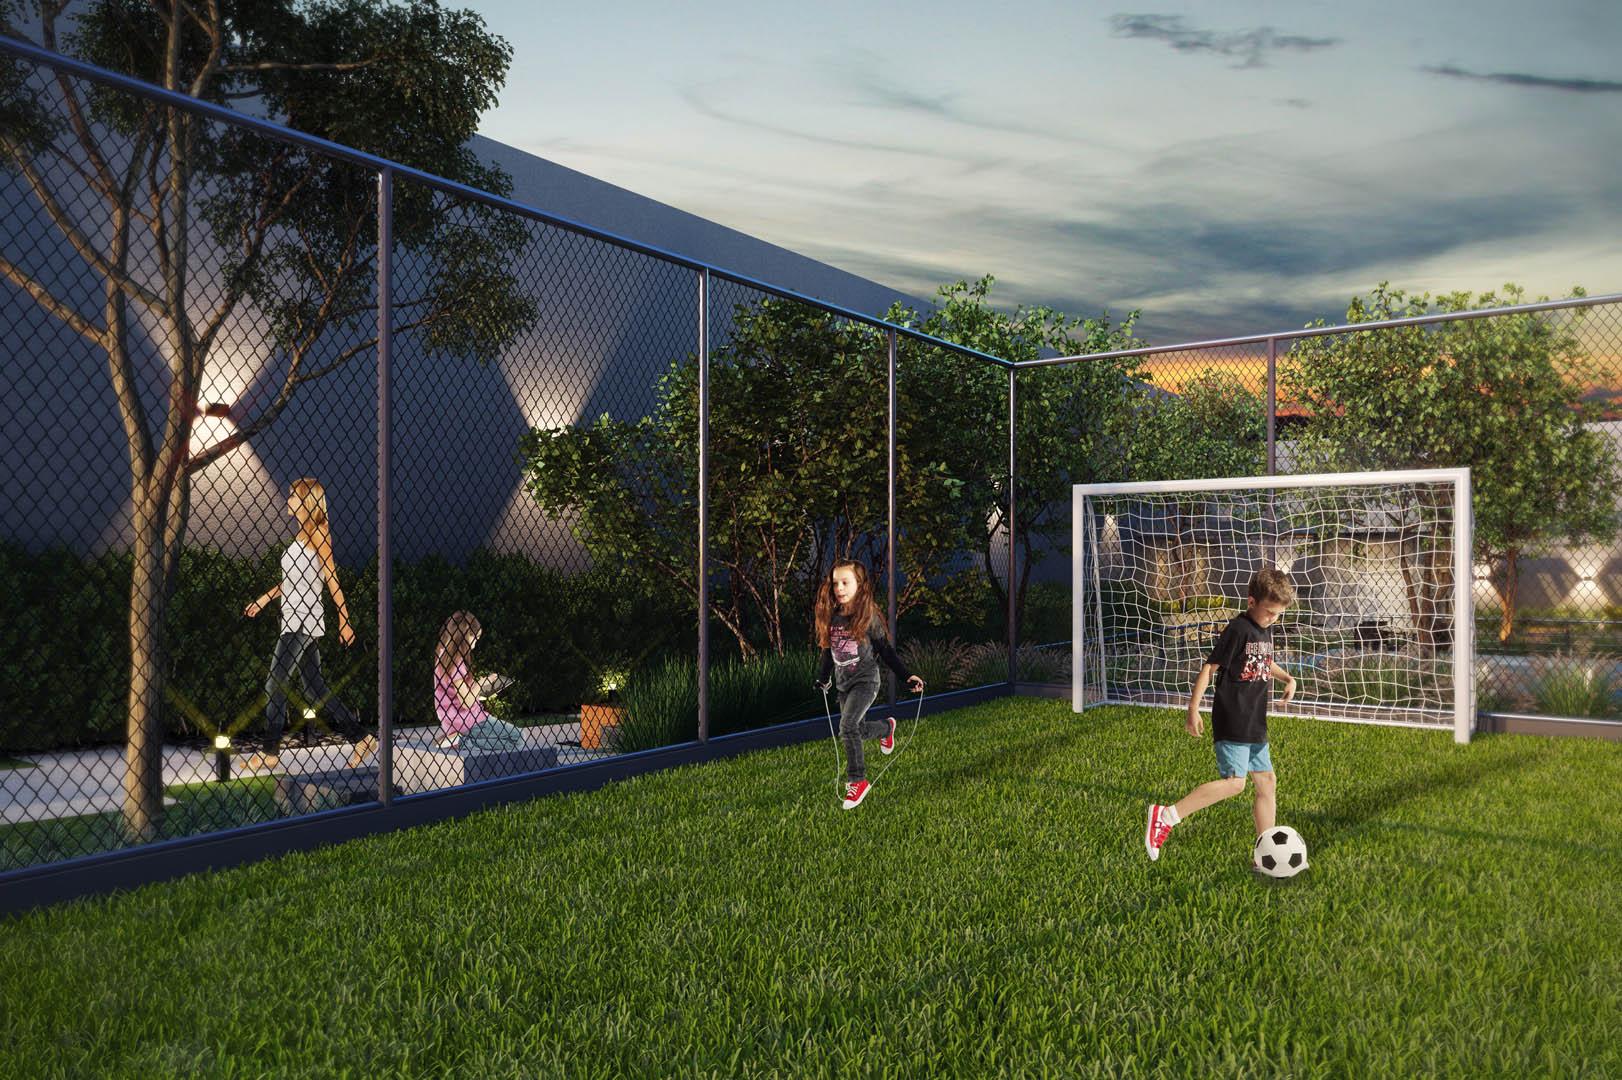 Campo de futboll